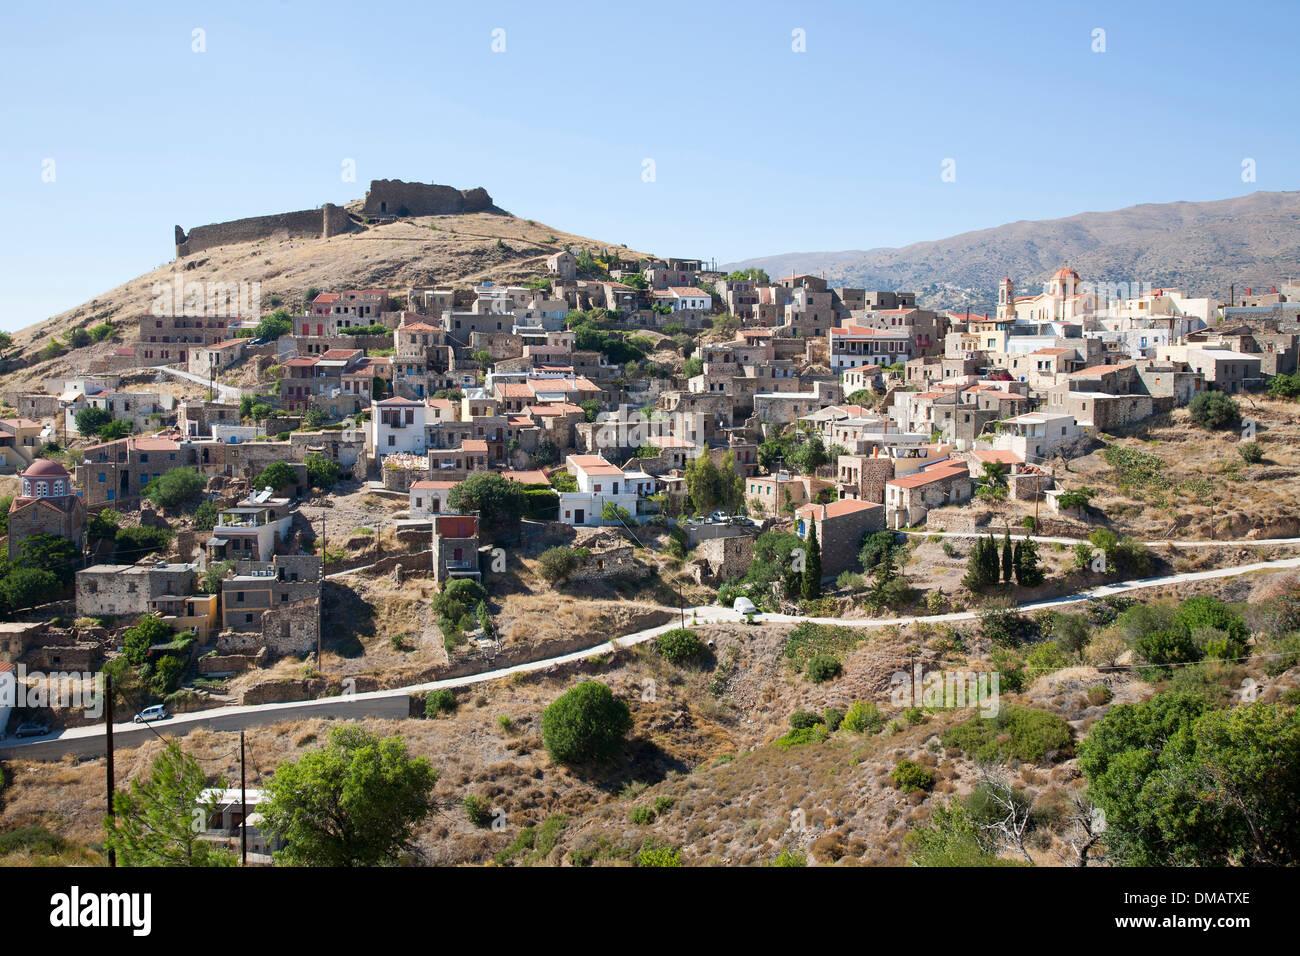 volissos village, island of chios, north east aegean sea, greece, europe Stock Photo